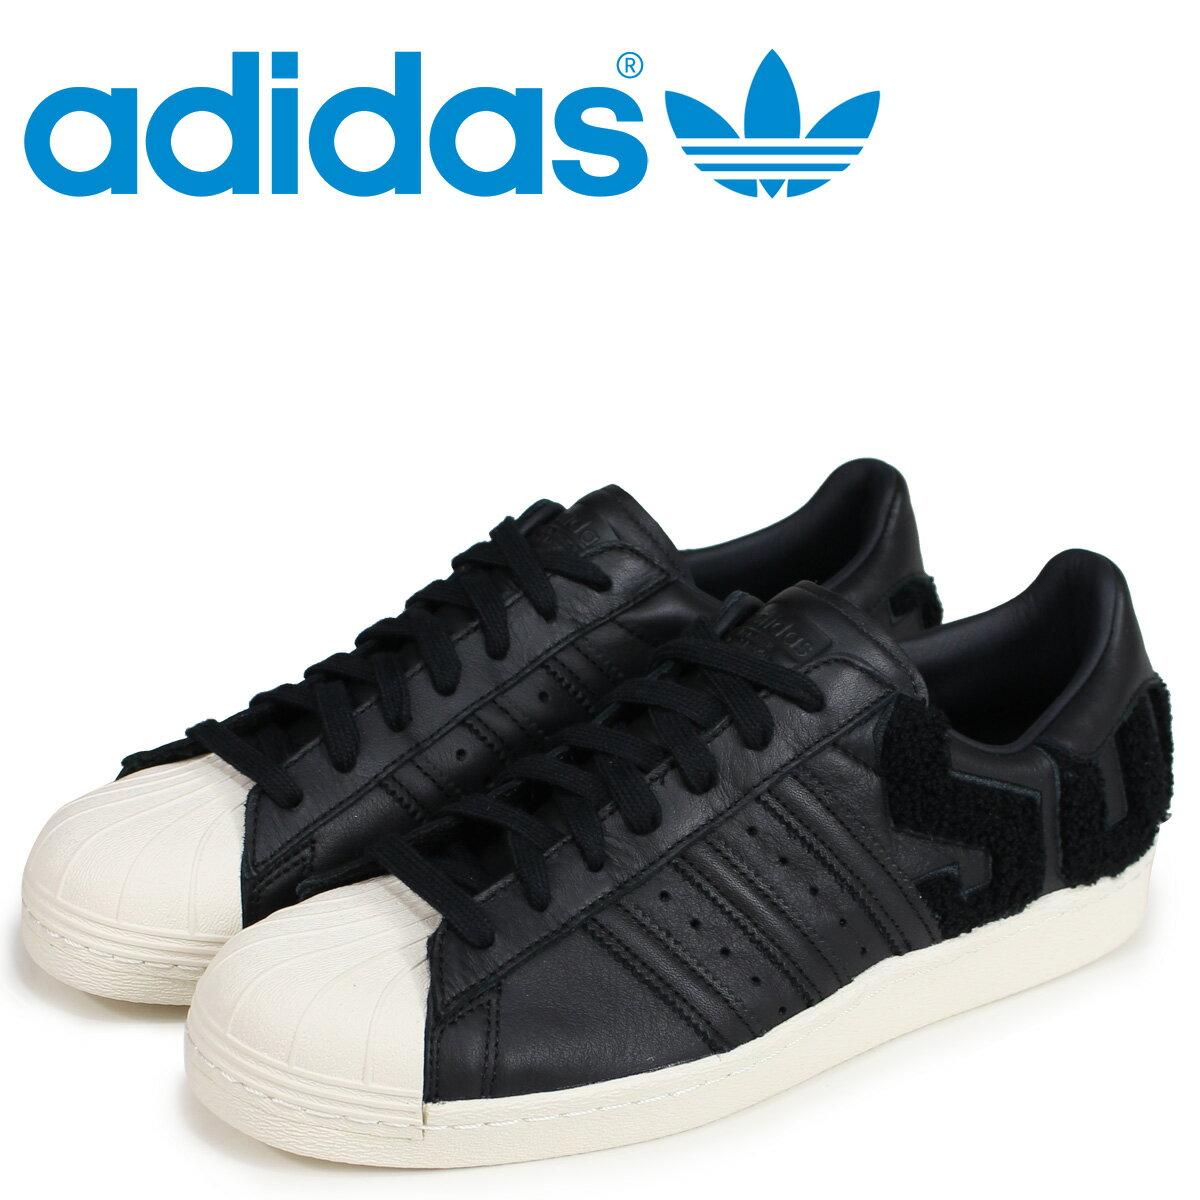 adidas Originals スーパースター アディダス オリジナルス スニーカー SUPERSTAR メンズ AQ0883 ブラック [予約商品 7/19頃入荷予定 新入荷]